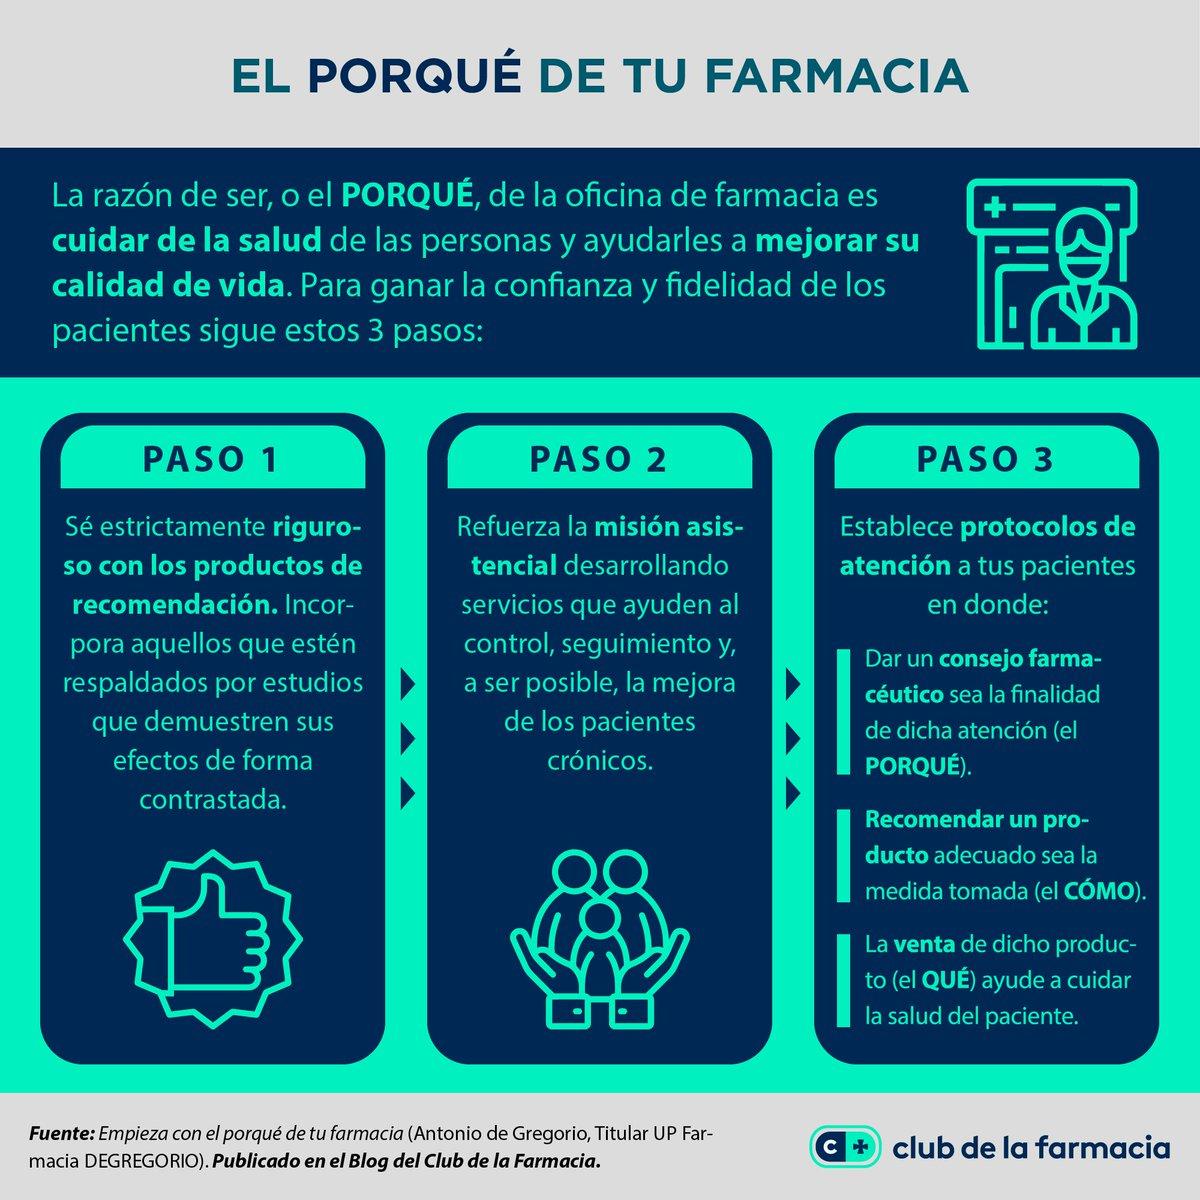 clubdelafarmacia (@clubfarmacia) | Twitter